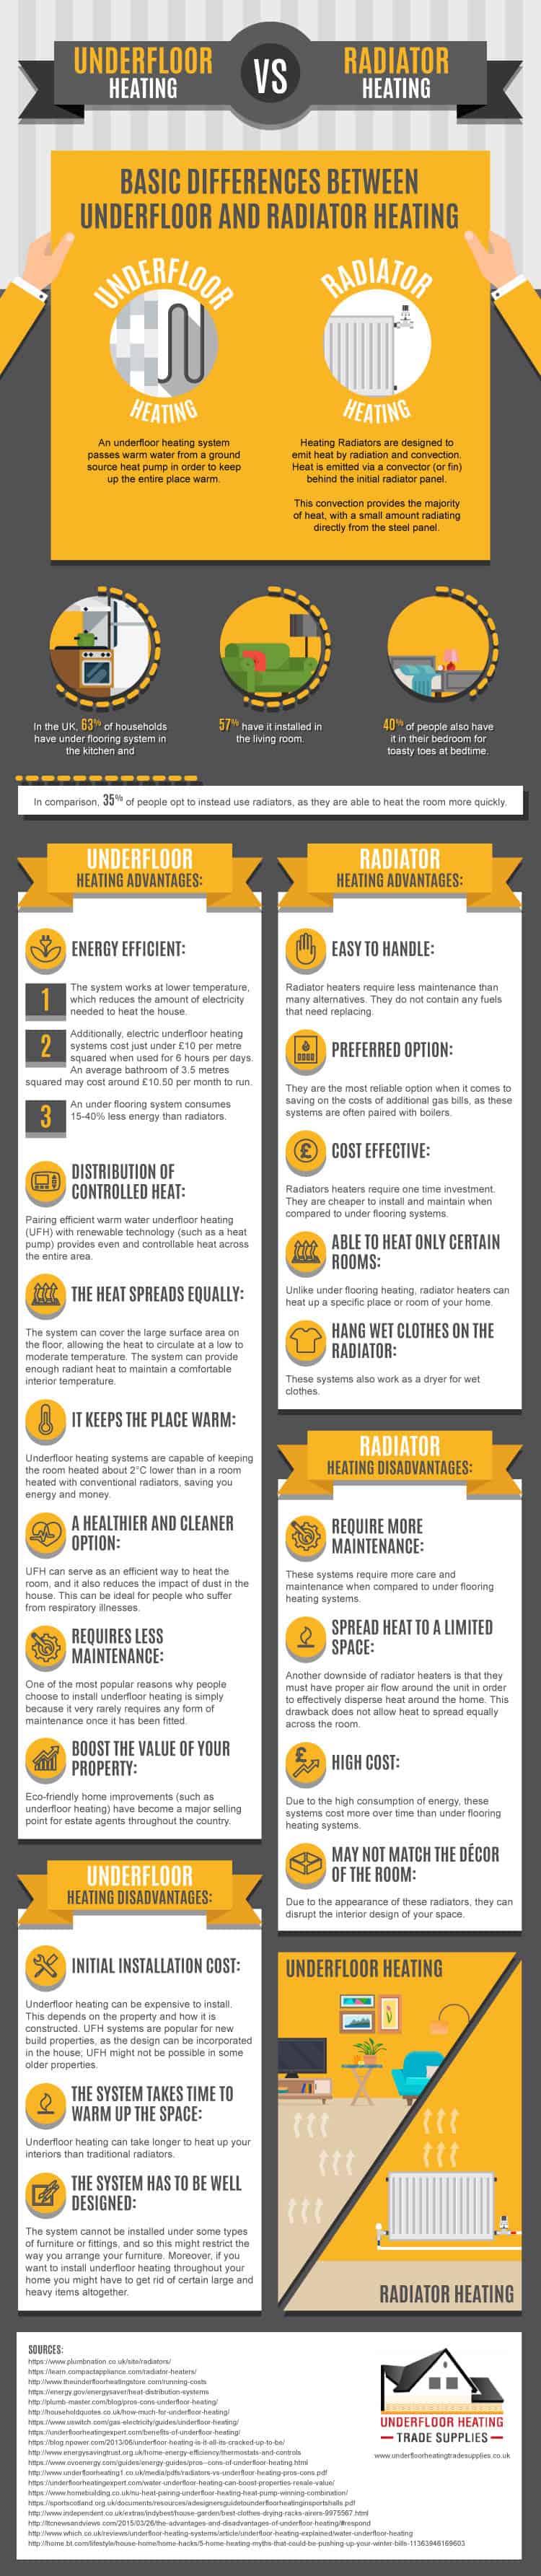 Underfloor Heating OR Radiators